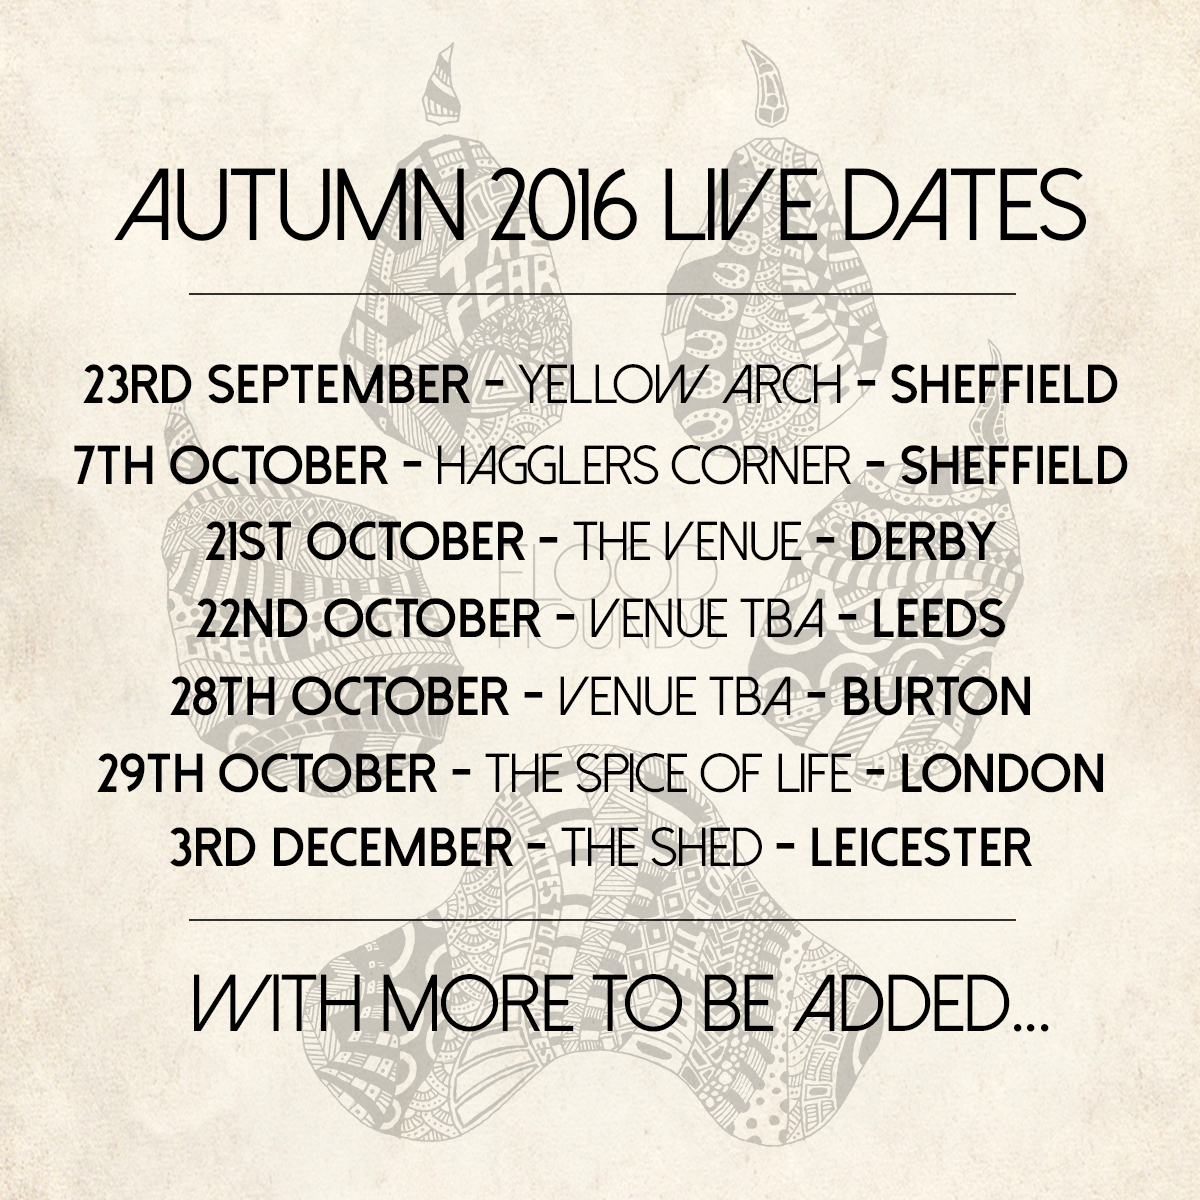 Tour dates square.jpg